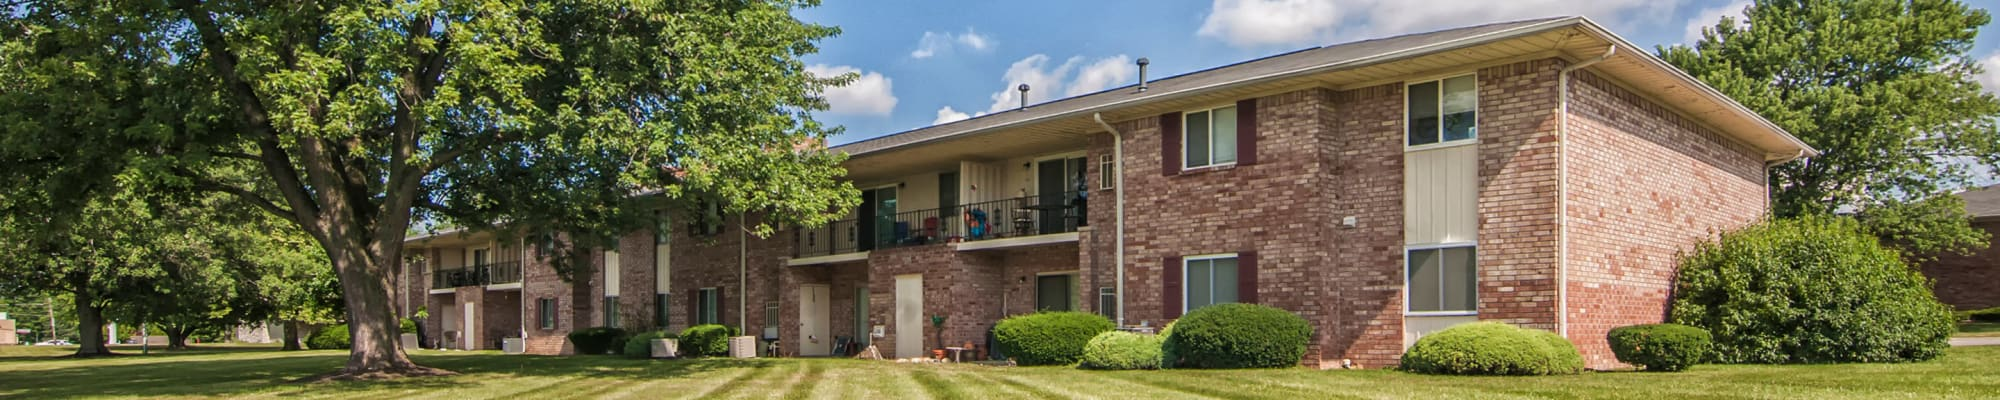 Learn about the neighborhood offerings around Beech Meadow in Beech Grove, Indiana.